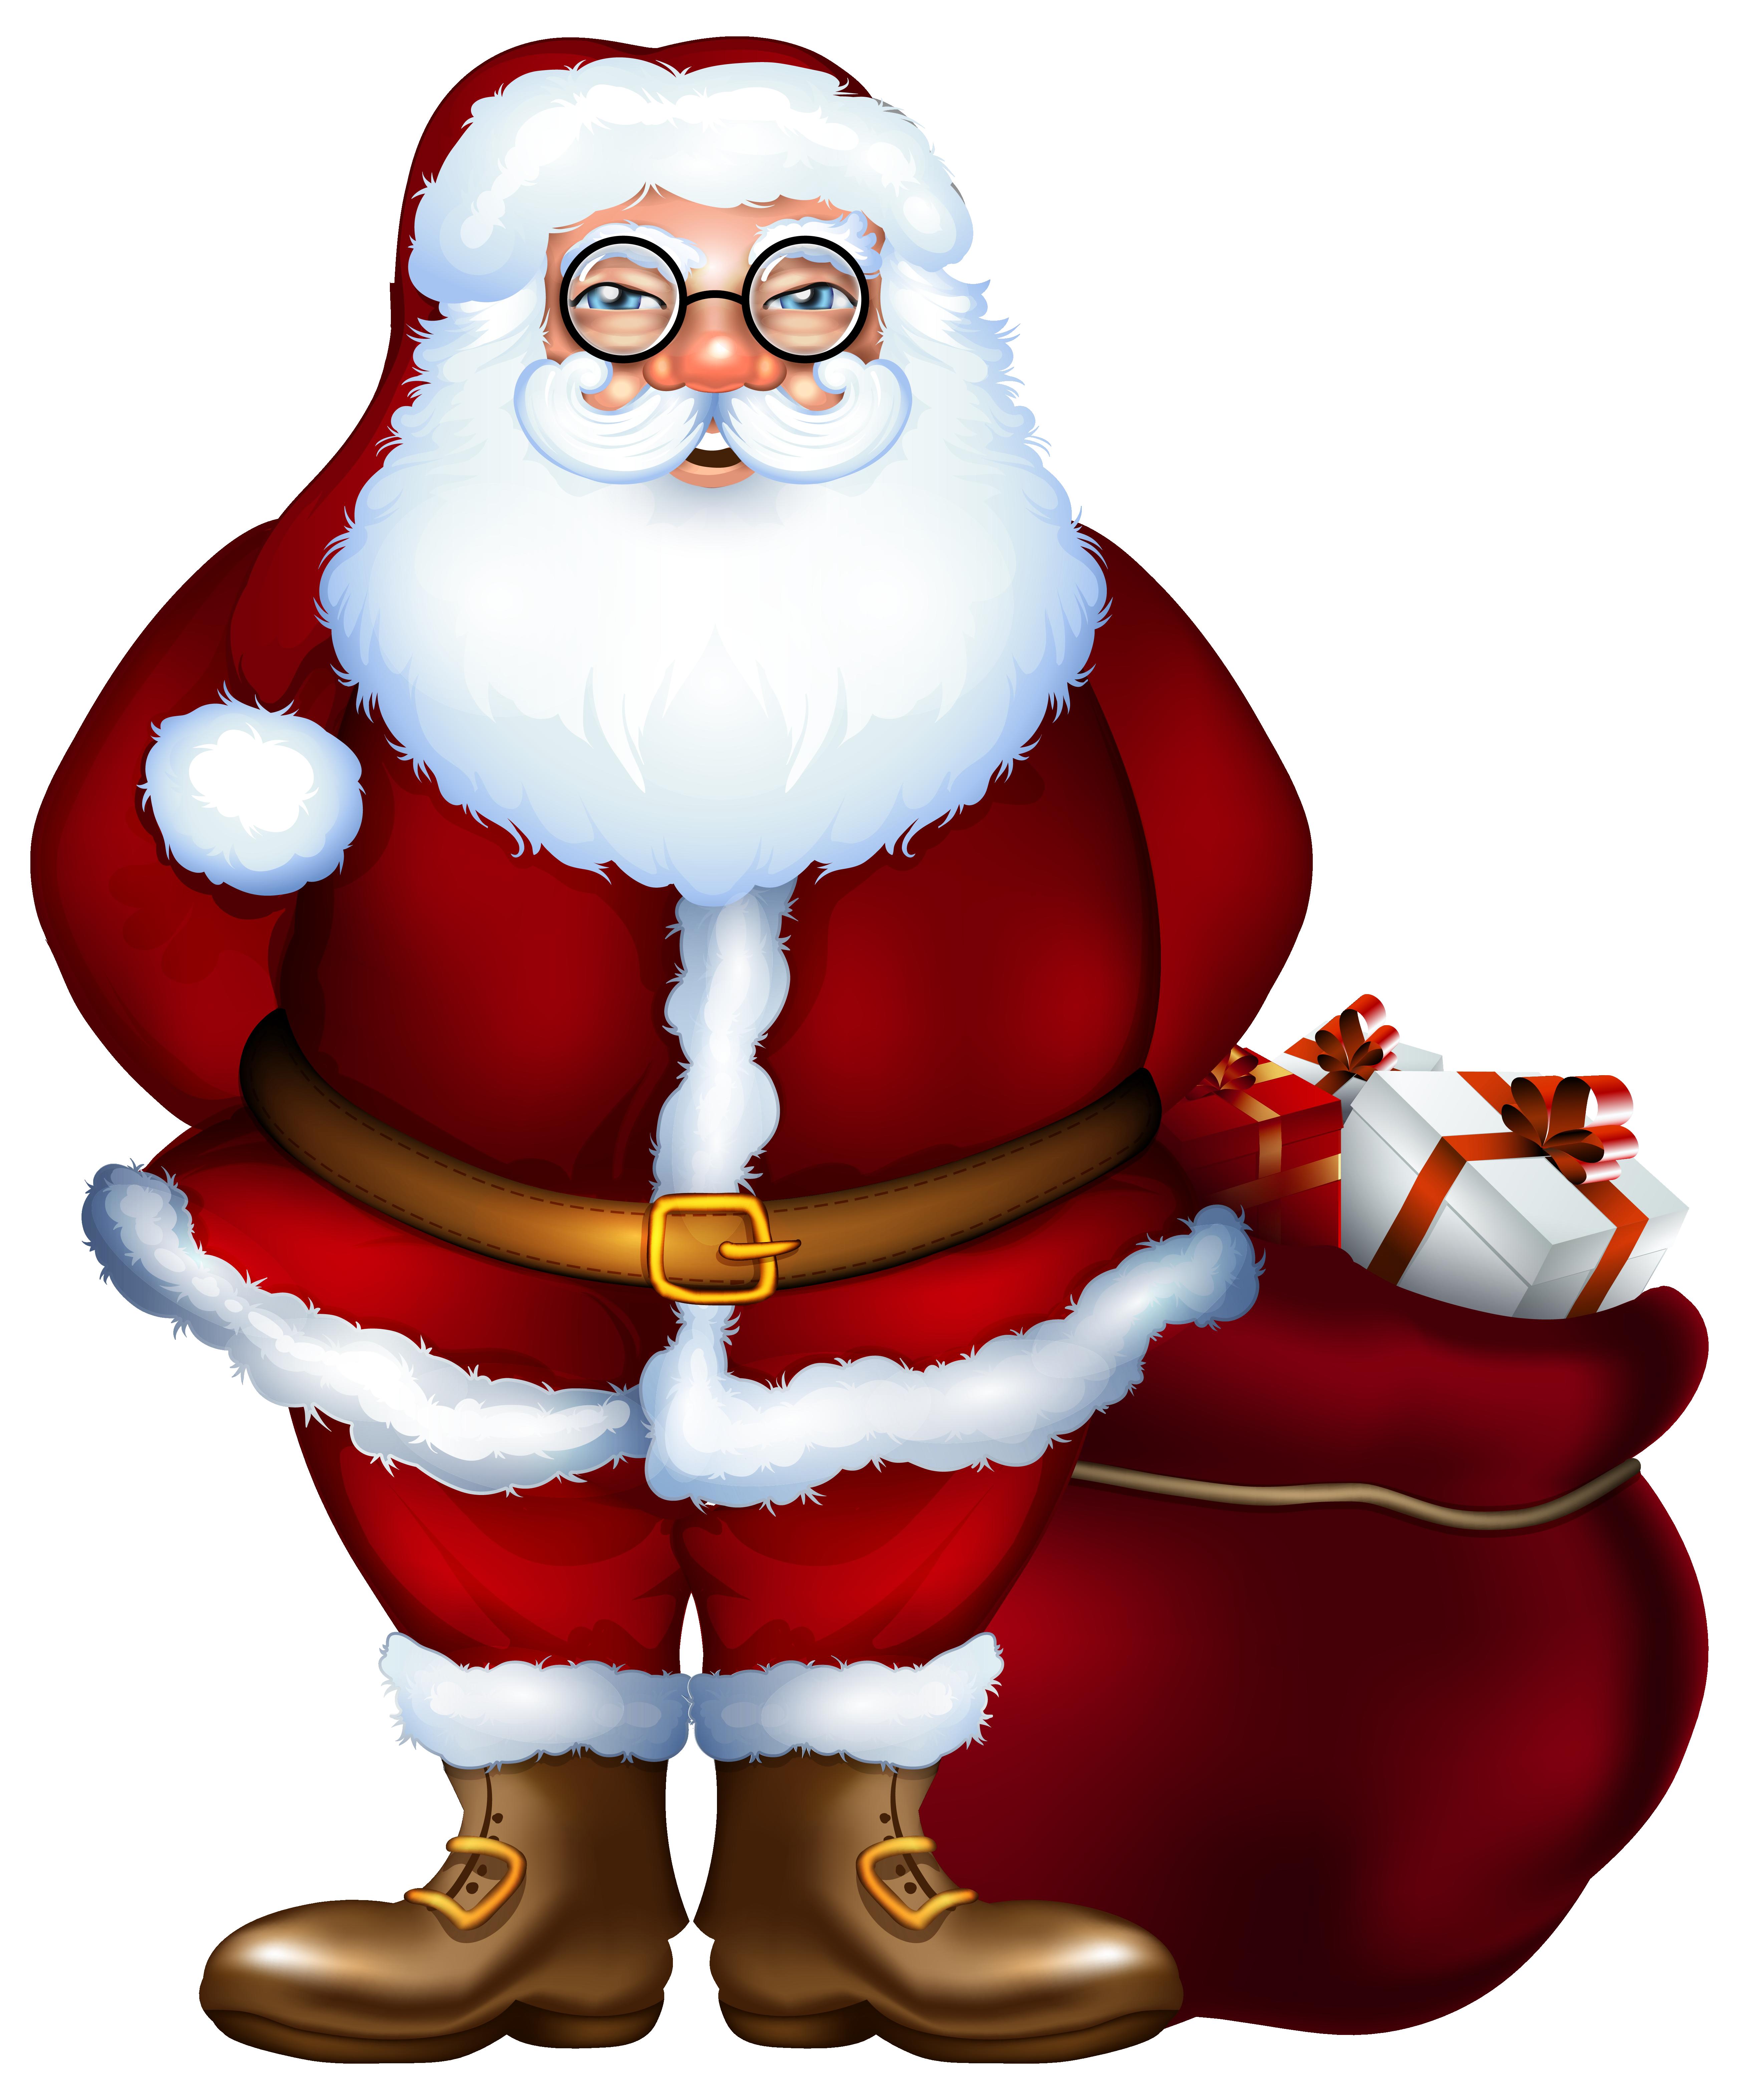 Santas Hat Hat Vector, Royalty Free Clipart, Christmas - Transparent  Christmas Hat Vector Png (#9634) - PinClipart